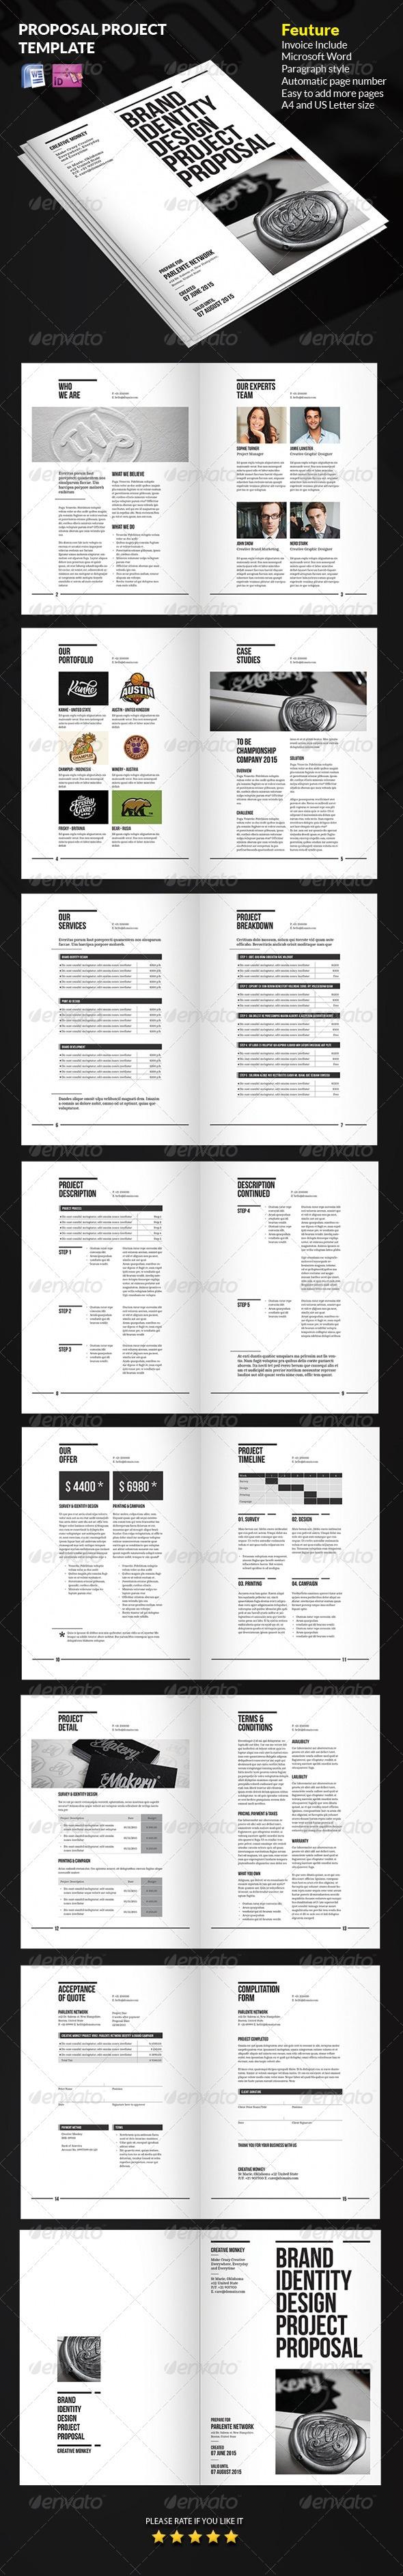 17 best tender design images on pinterest page layout charts and editorial design. Black Bedroom Furniture Sets. Home Design Ideas